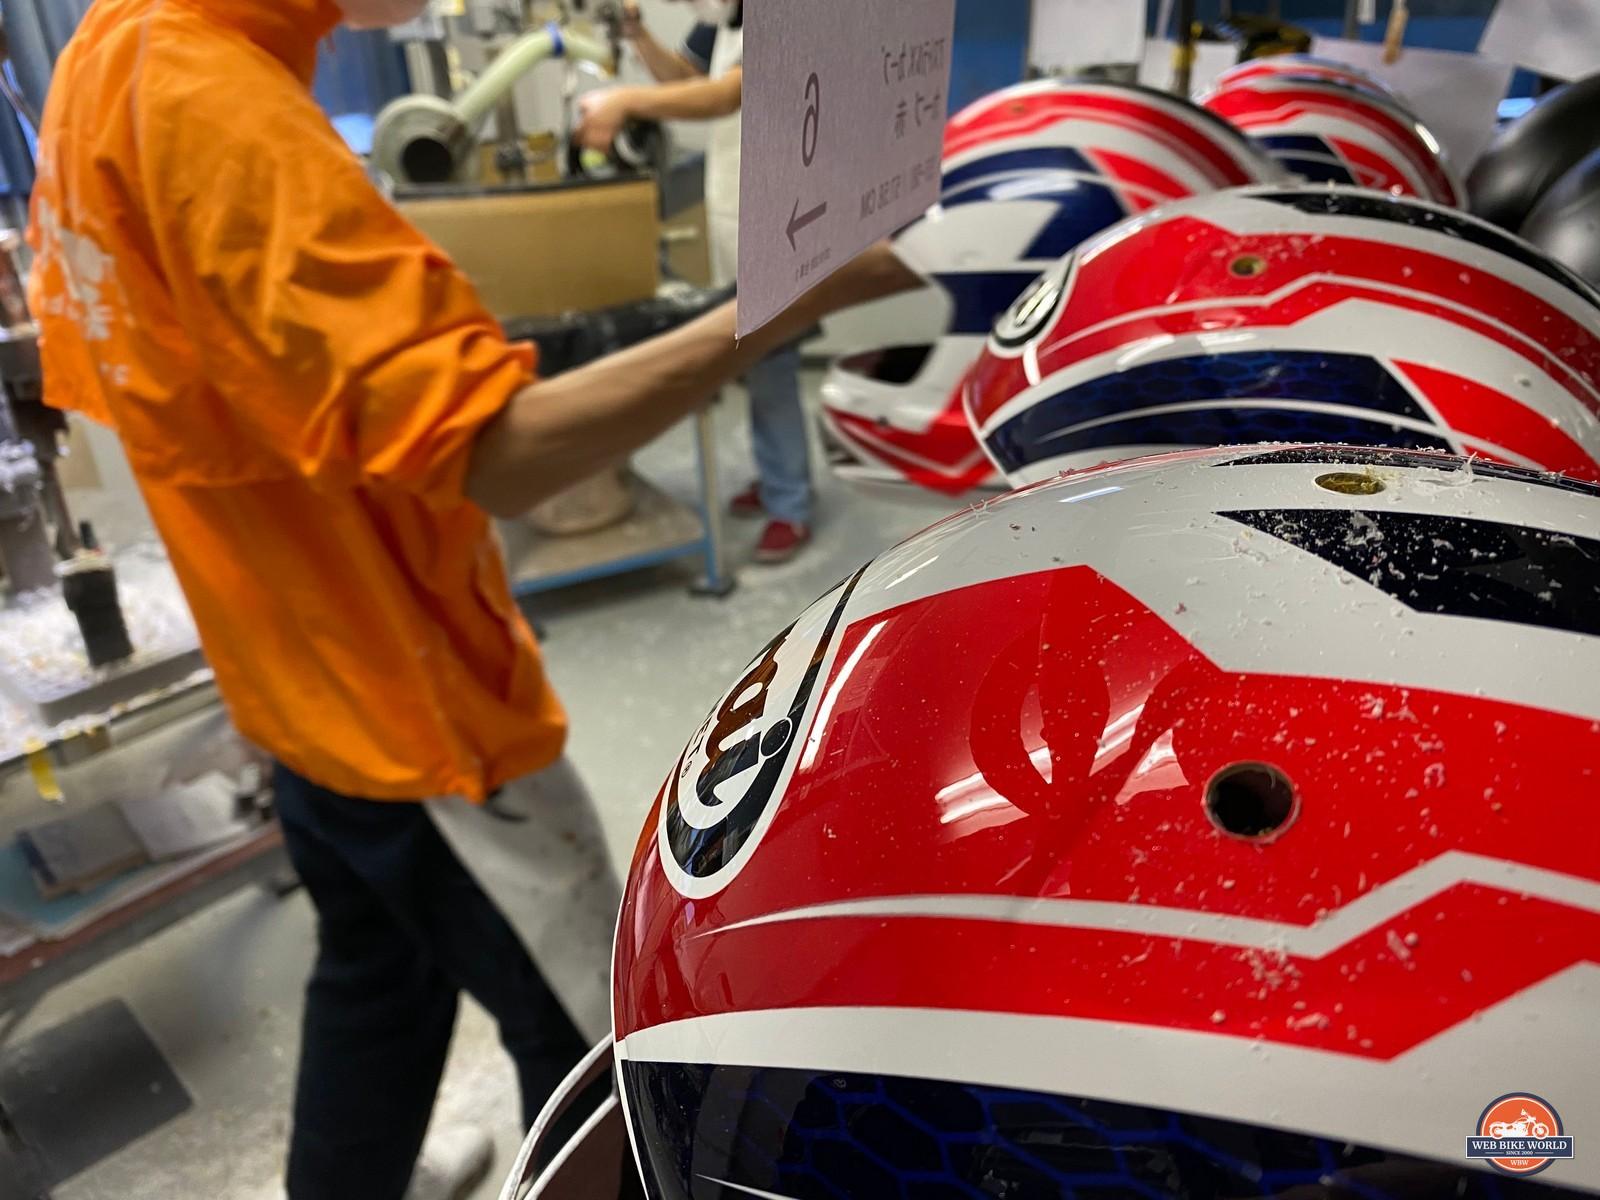 Freshly drilled ventilation holes in Arai helmet shells.